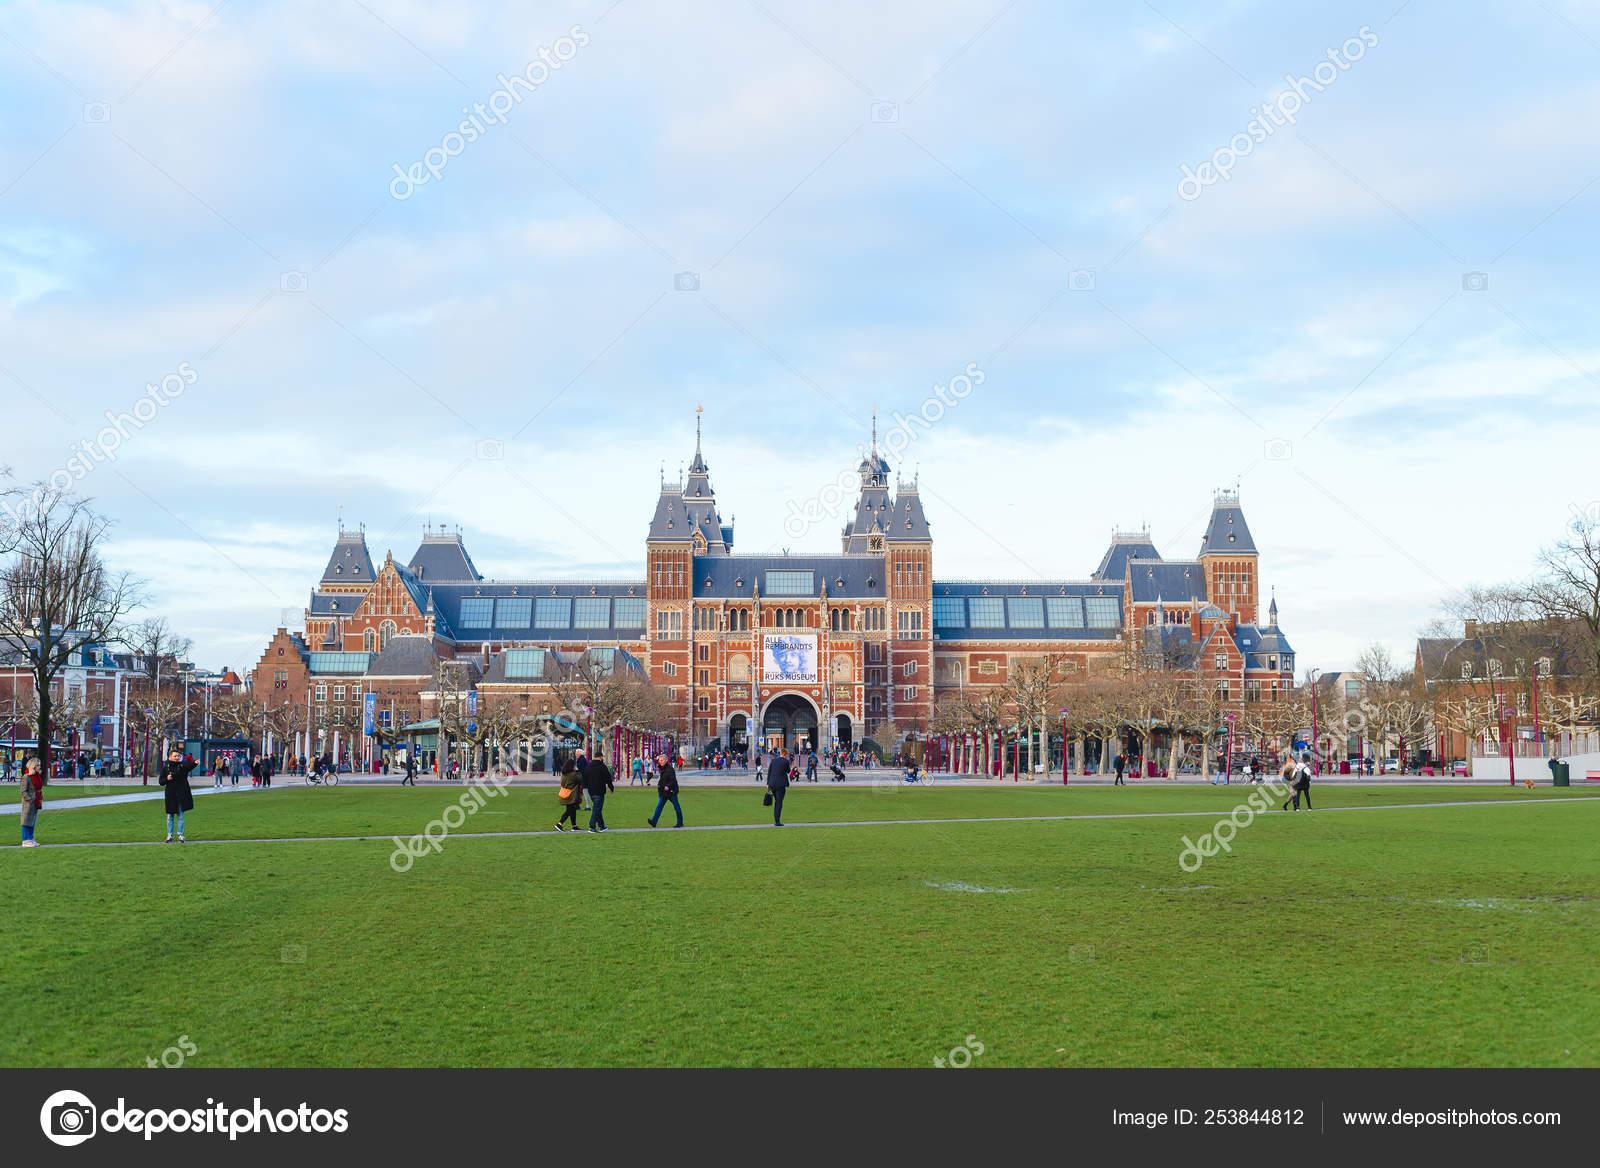 AMSTERDAM, NETHERLANDS - March 14, 2019: Rembrandt Exhibition in